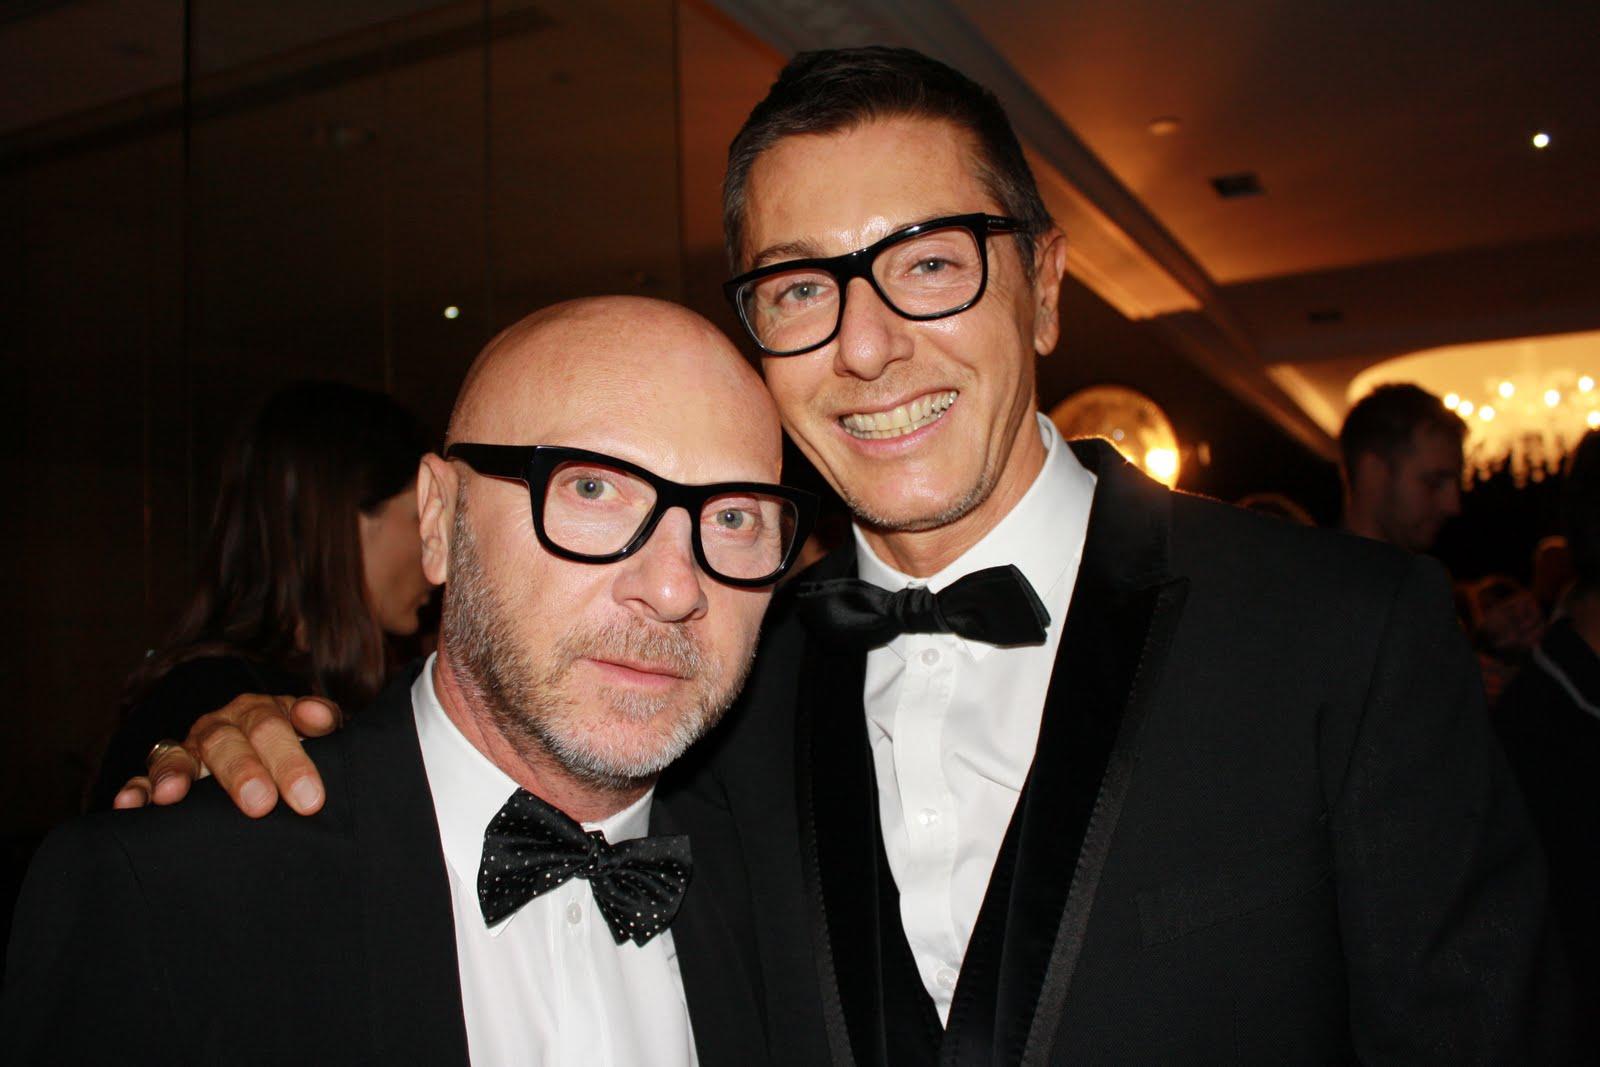 Designers Dolce   Gabbana Get Prison Sentence Over Tax Evasion - The ... 54115d63b89